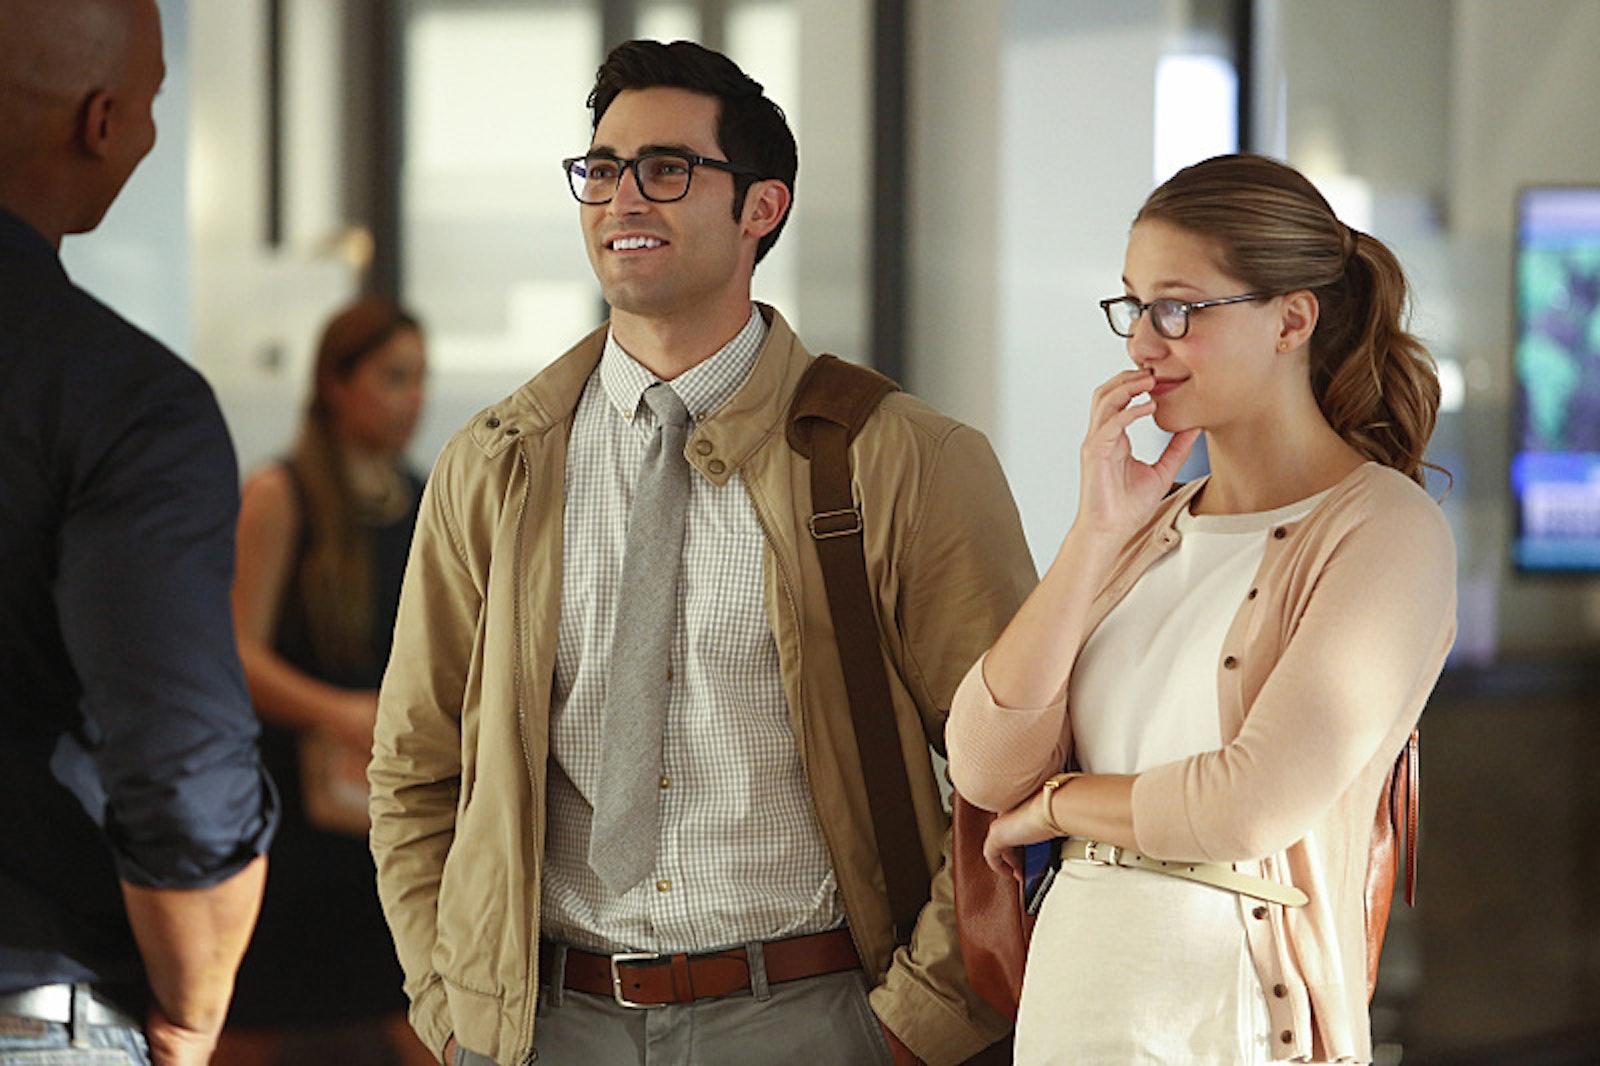 Kara Danvers and Clark Kent in the Season 2 premiere of 'Supergirl